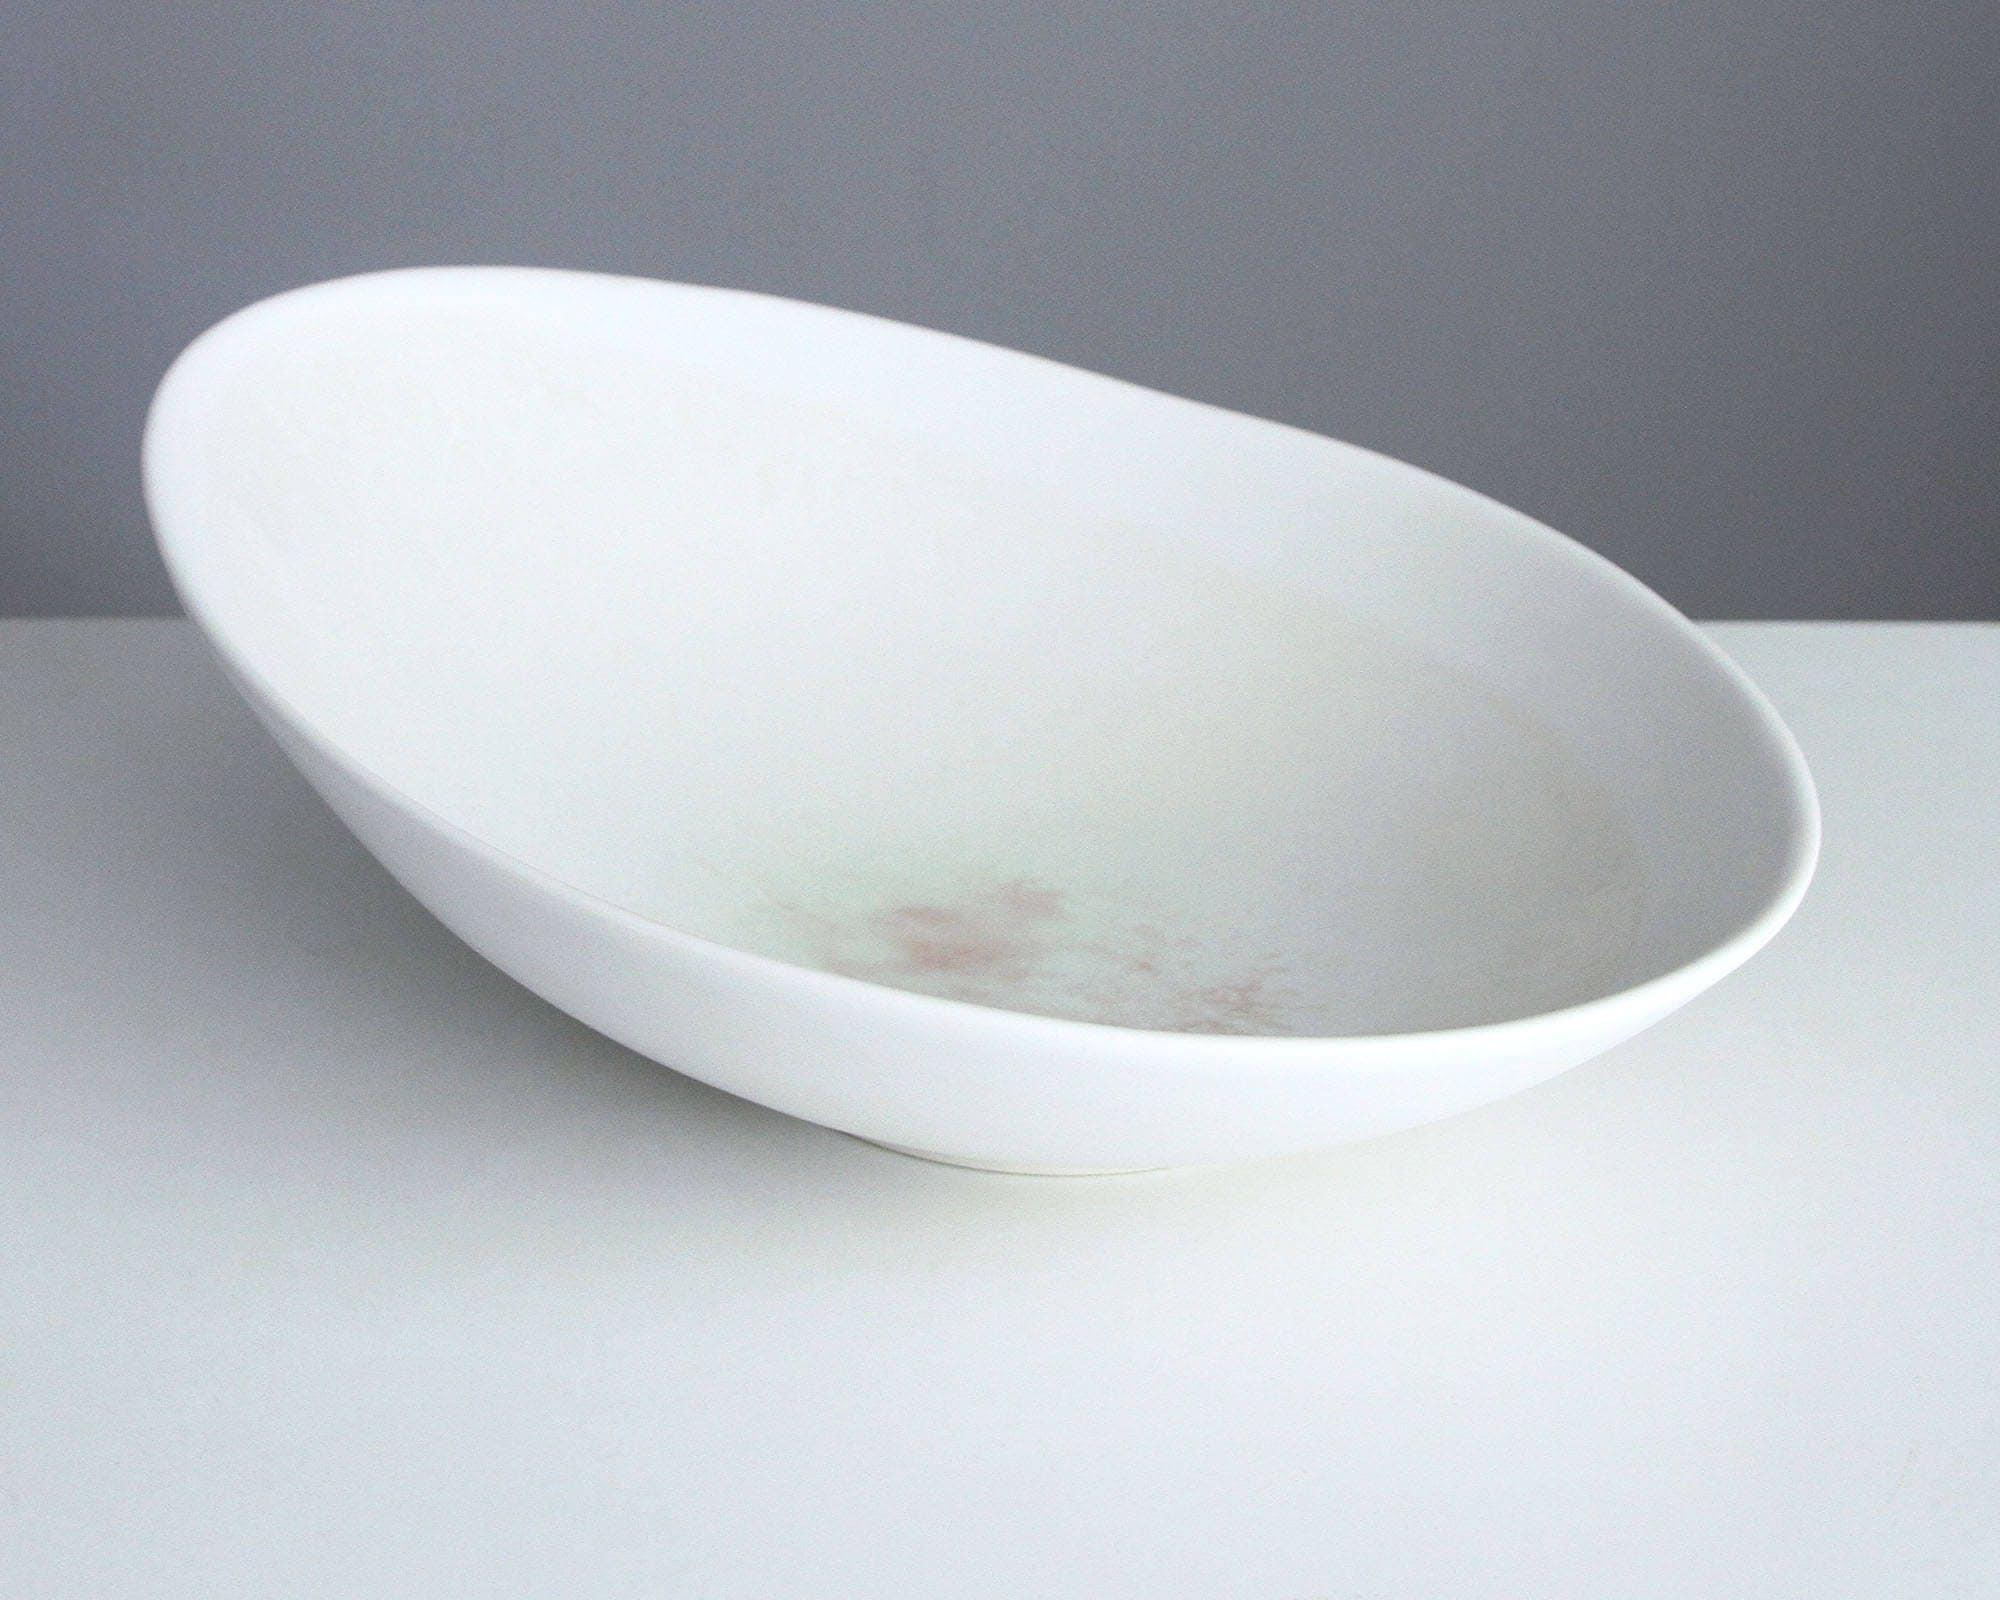 Oval centerpiece bowl modern white blush pink tilt